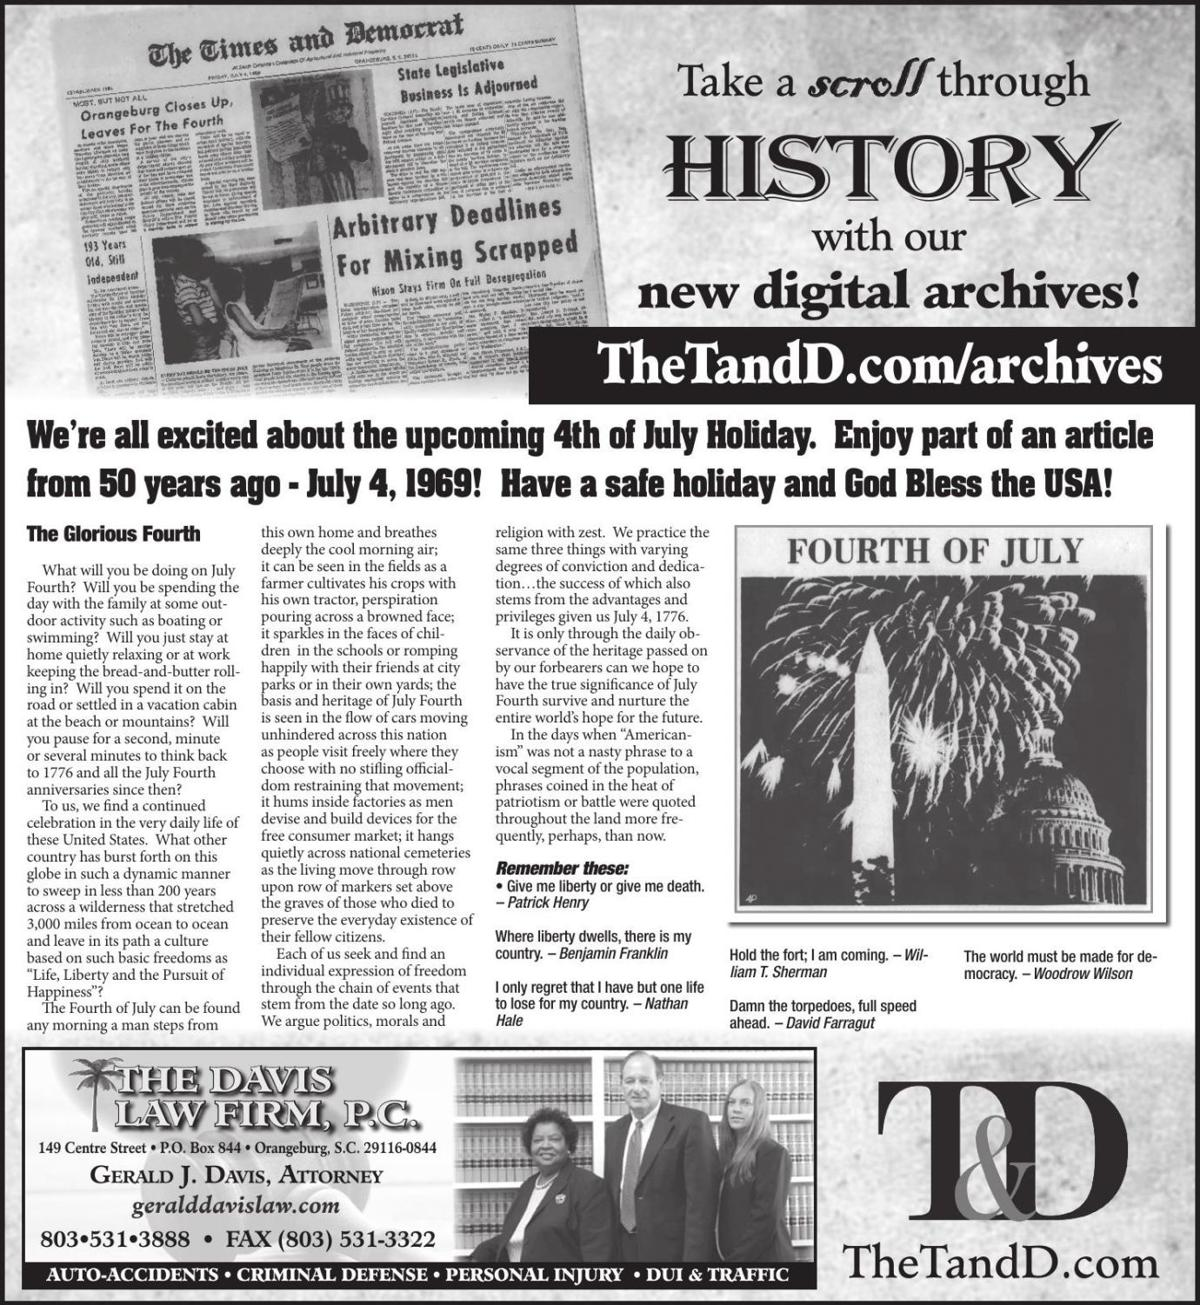 TheTandD.com/archives June 30, 2019